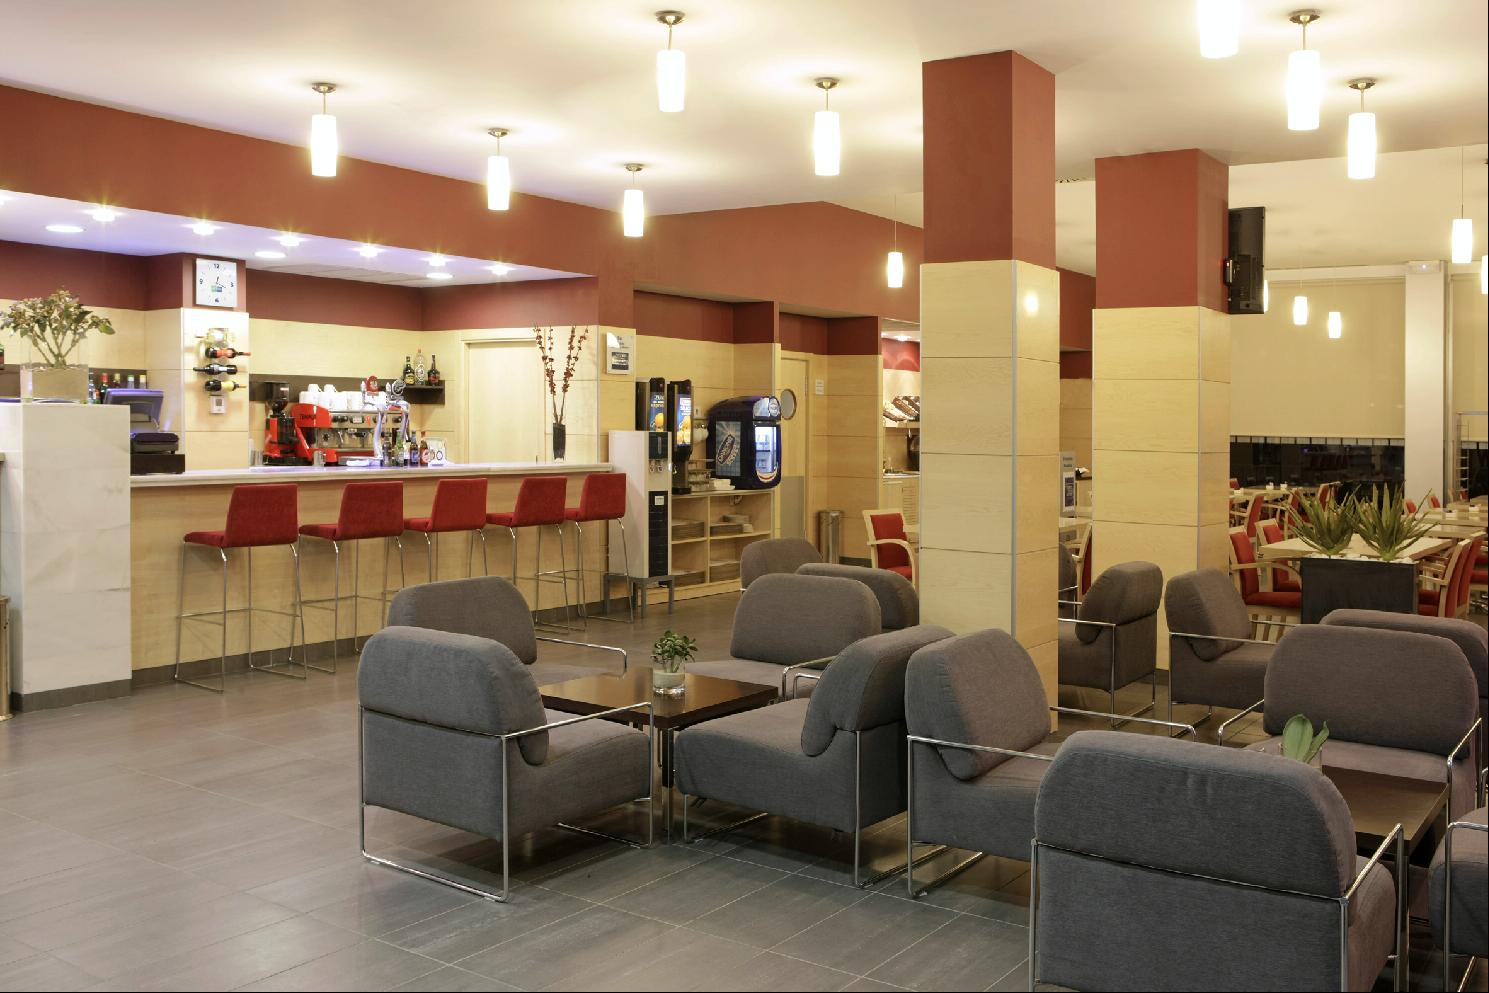 HOLIDAY INN EXPRESS MALAGA AIRPORT - Hotel cerca del Palacio de Deportes Martín Carpena